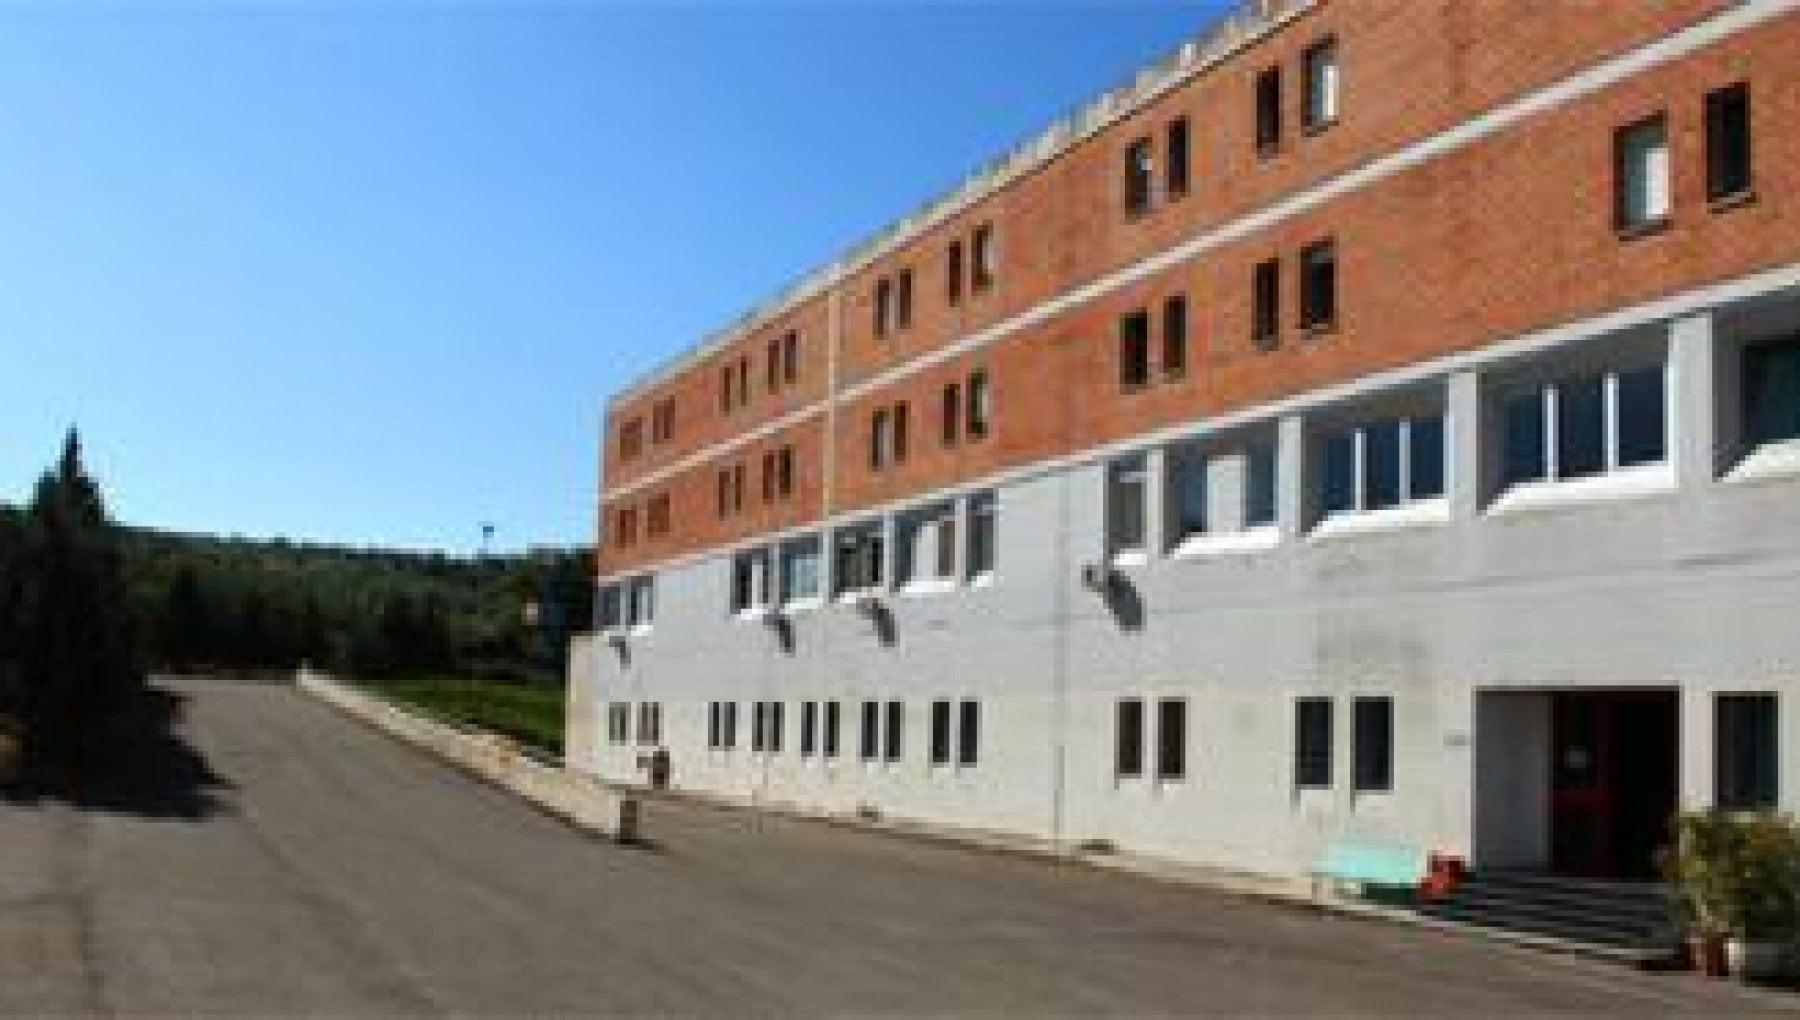 Siena, saranno processati per tortura 5 agenti penitenziari